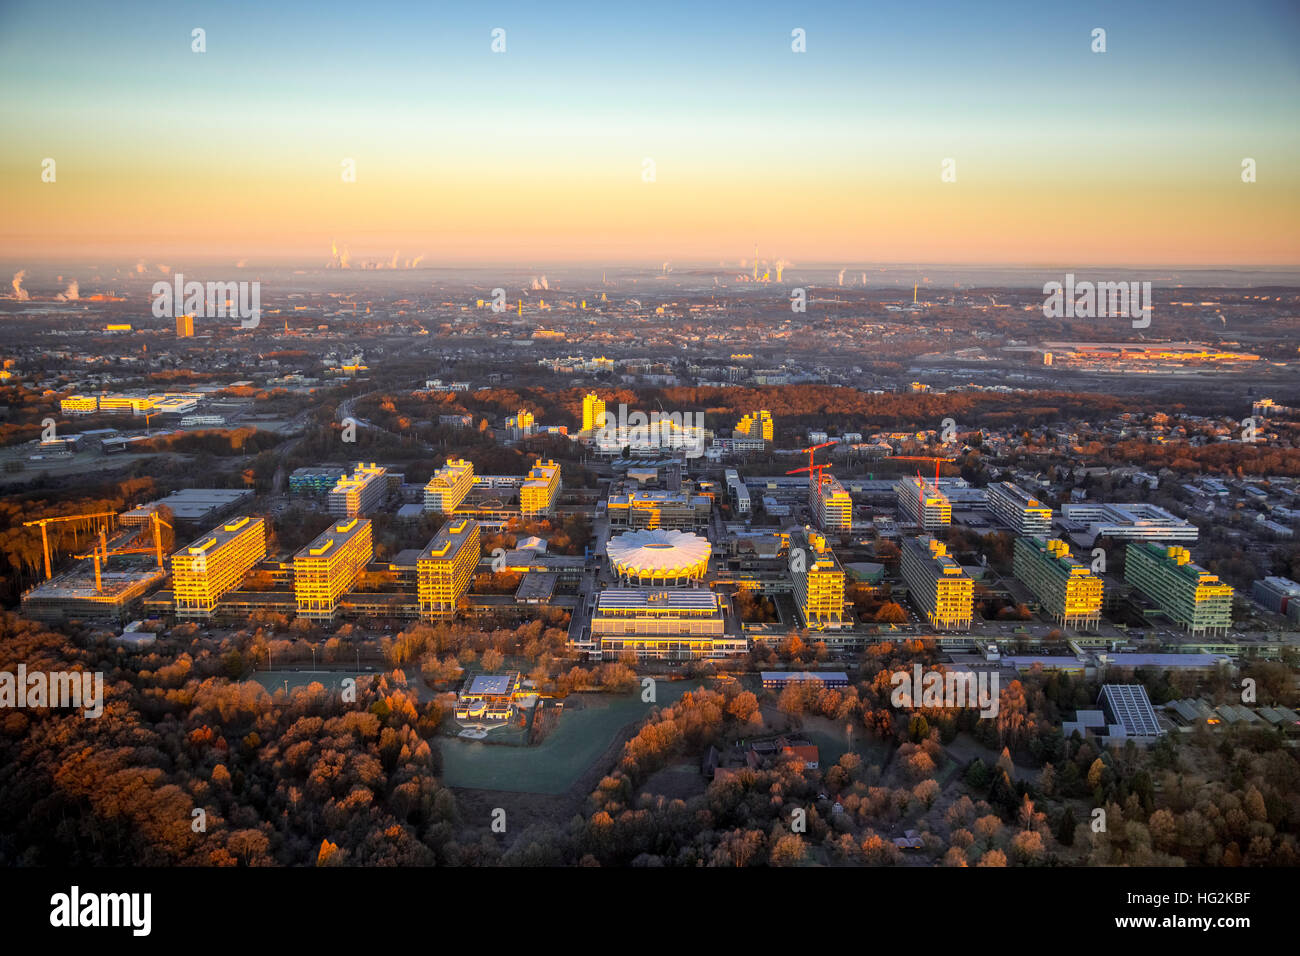 Aerial, Sunrise at RUB Ruhr University Bochum, Bochum, Ruhr aeria, north rhine-westphalia, Germany, Europe, Aerial - Stock Image